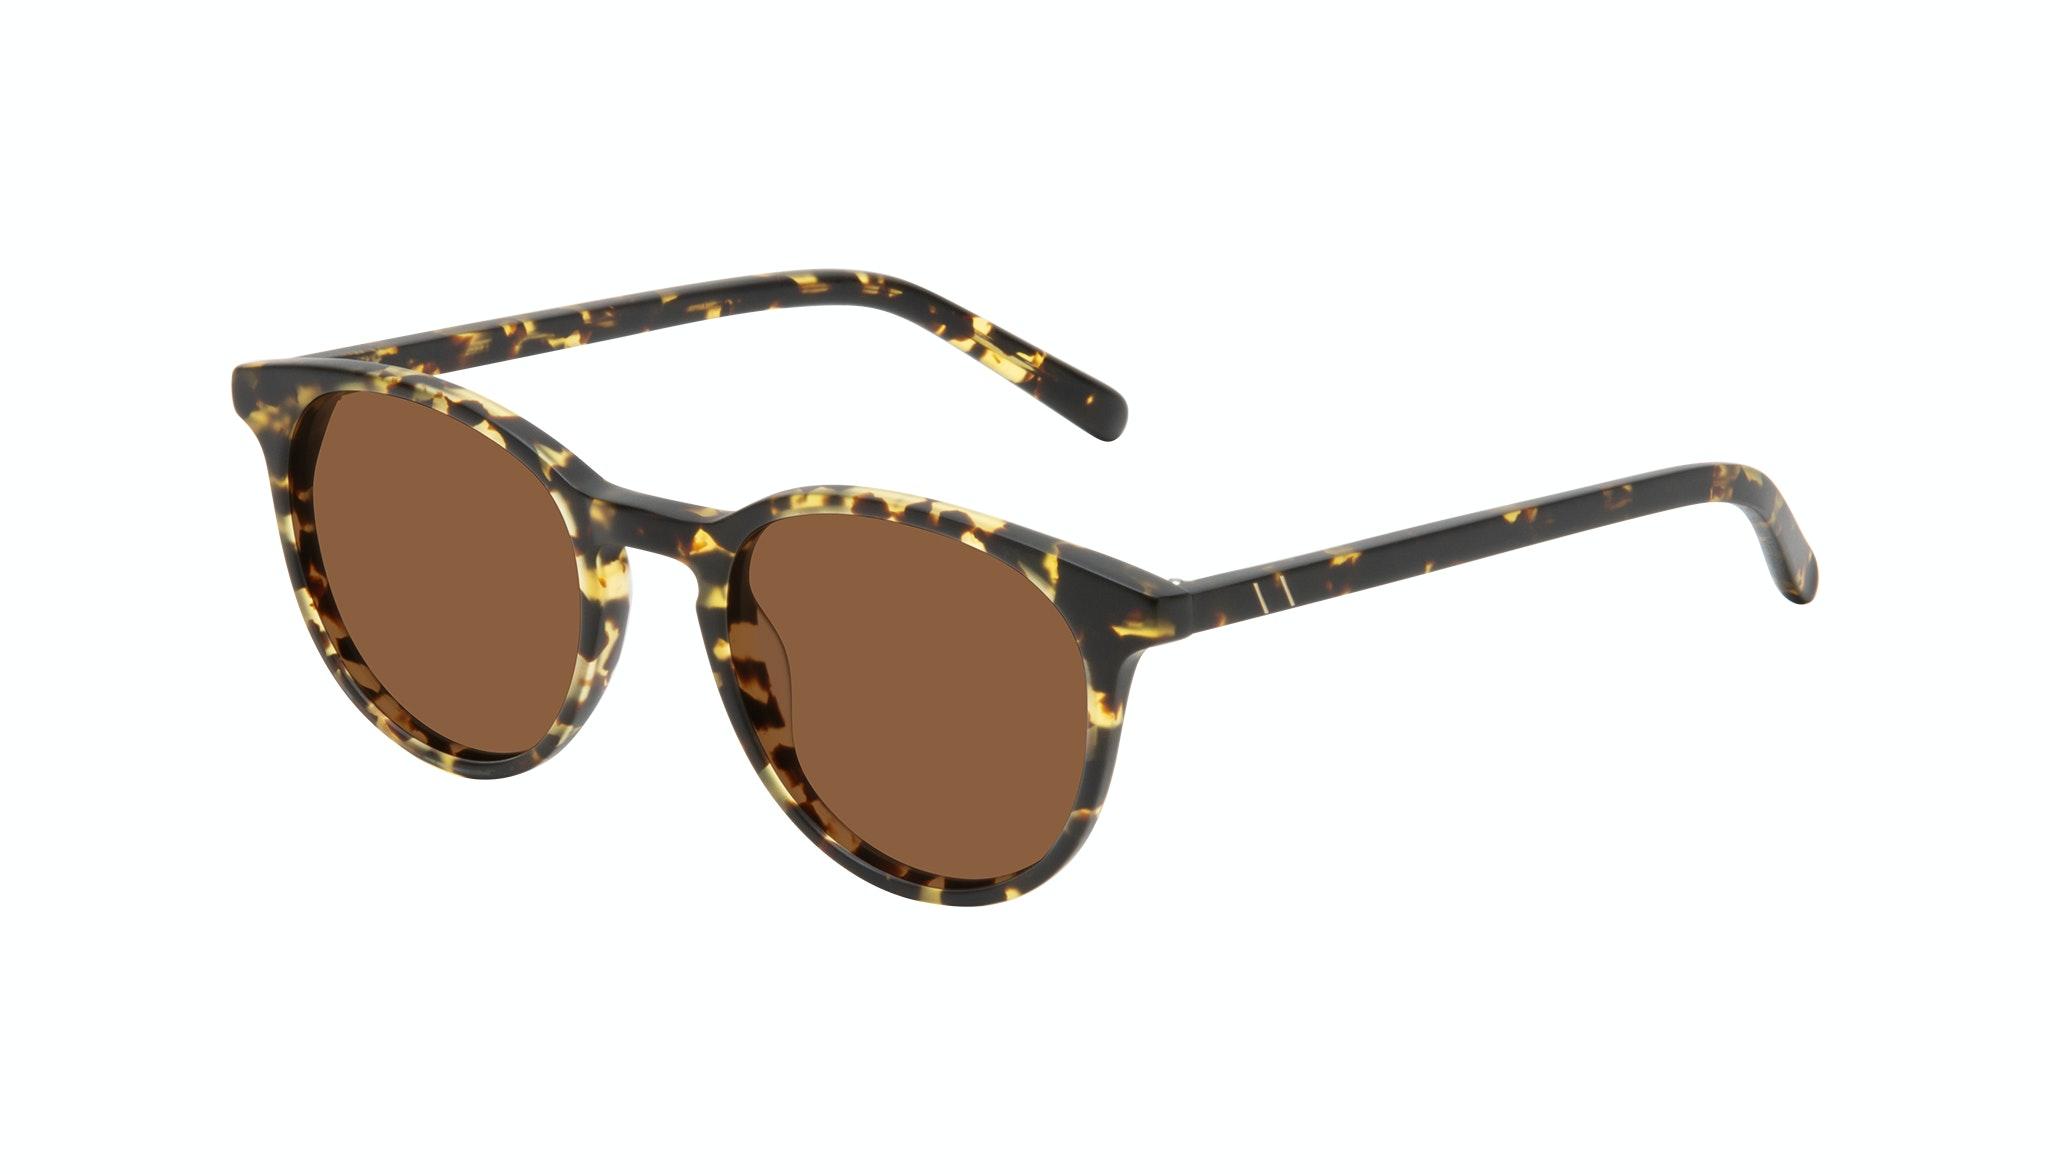 Affordable Fashion Glasses Round Sunglasses Men Select Tortoise Matte Tilt